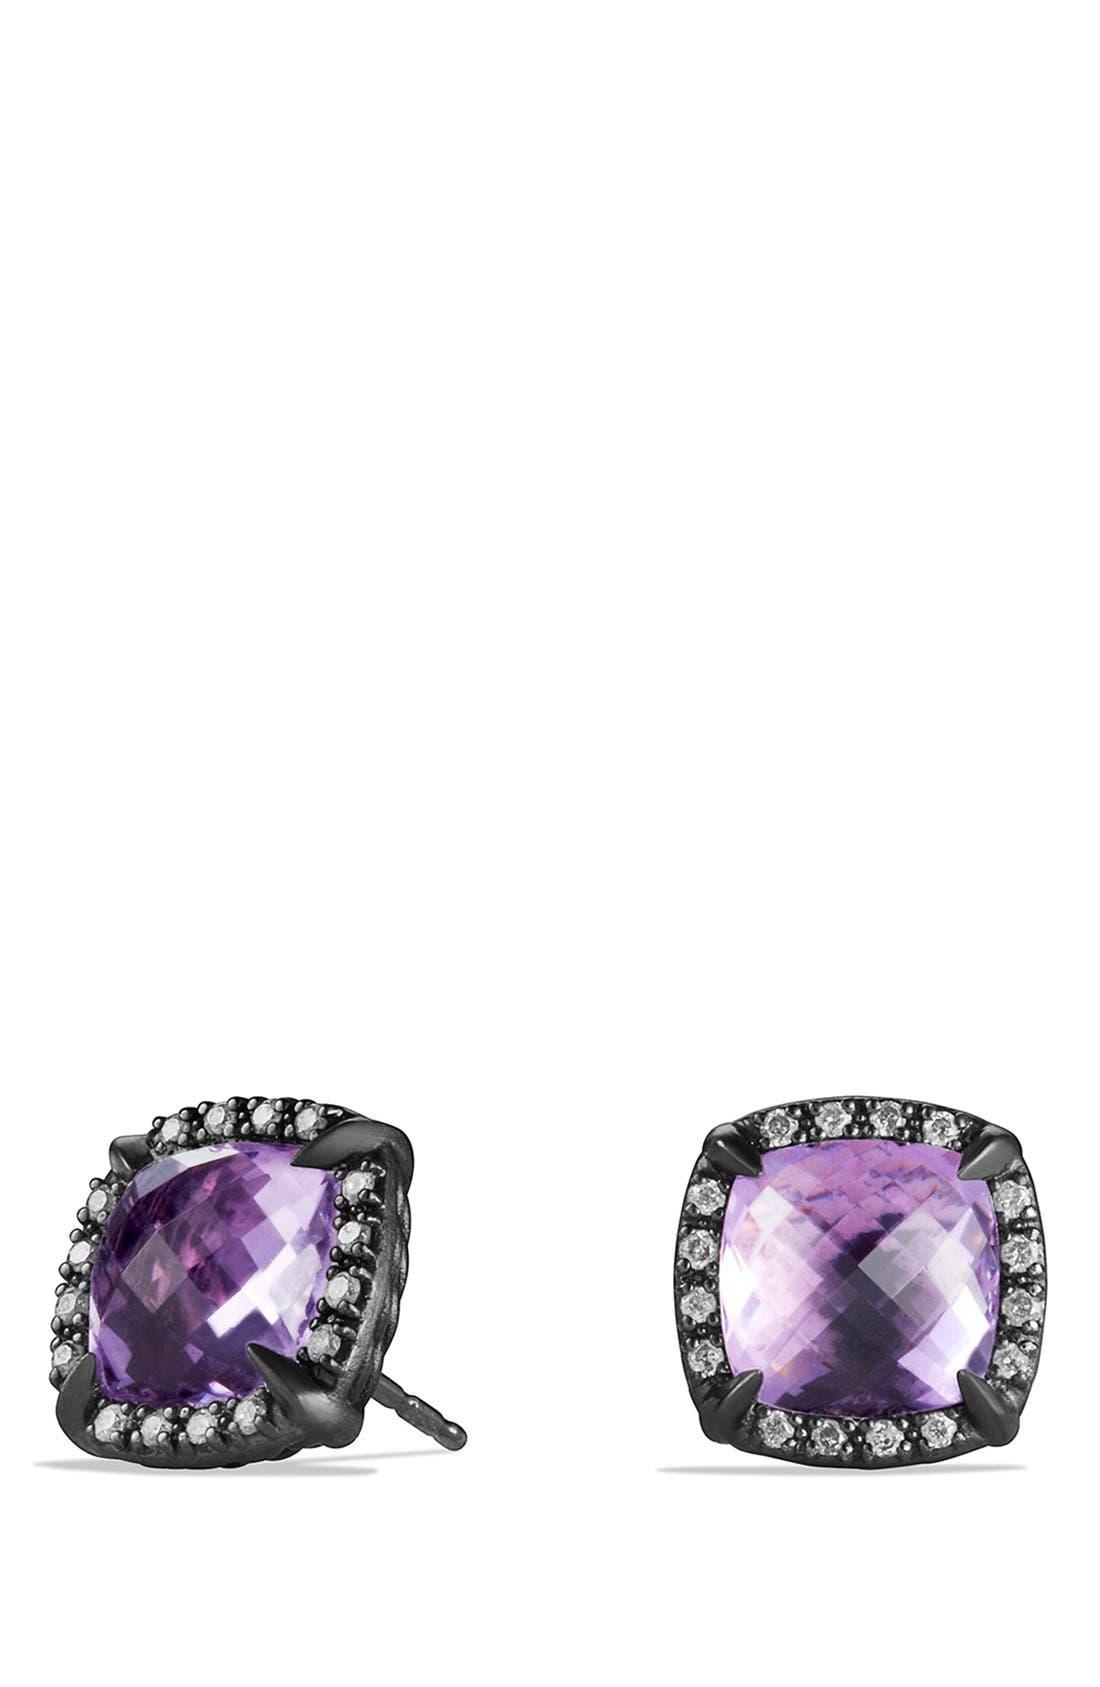 David Yurman 'Châtelaine' Earrings with Semiprecious Stone and Diamonds